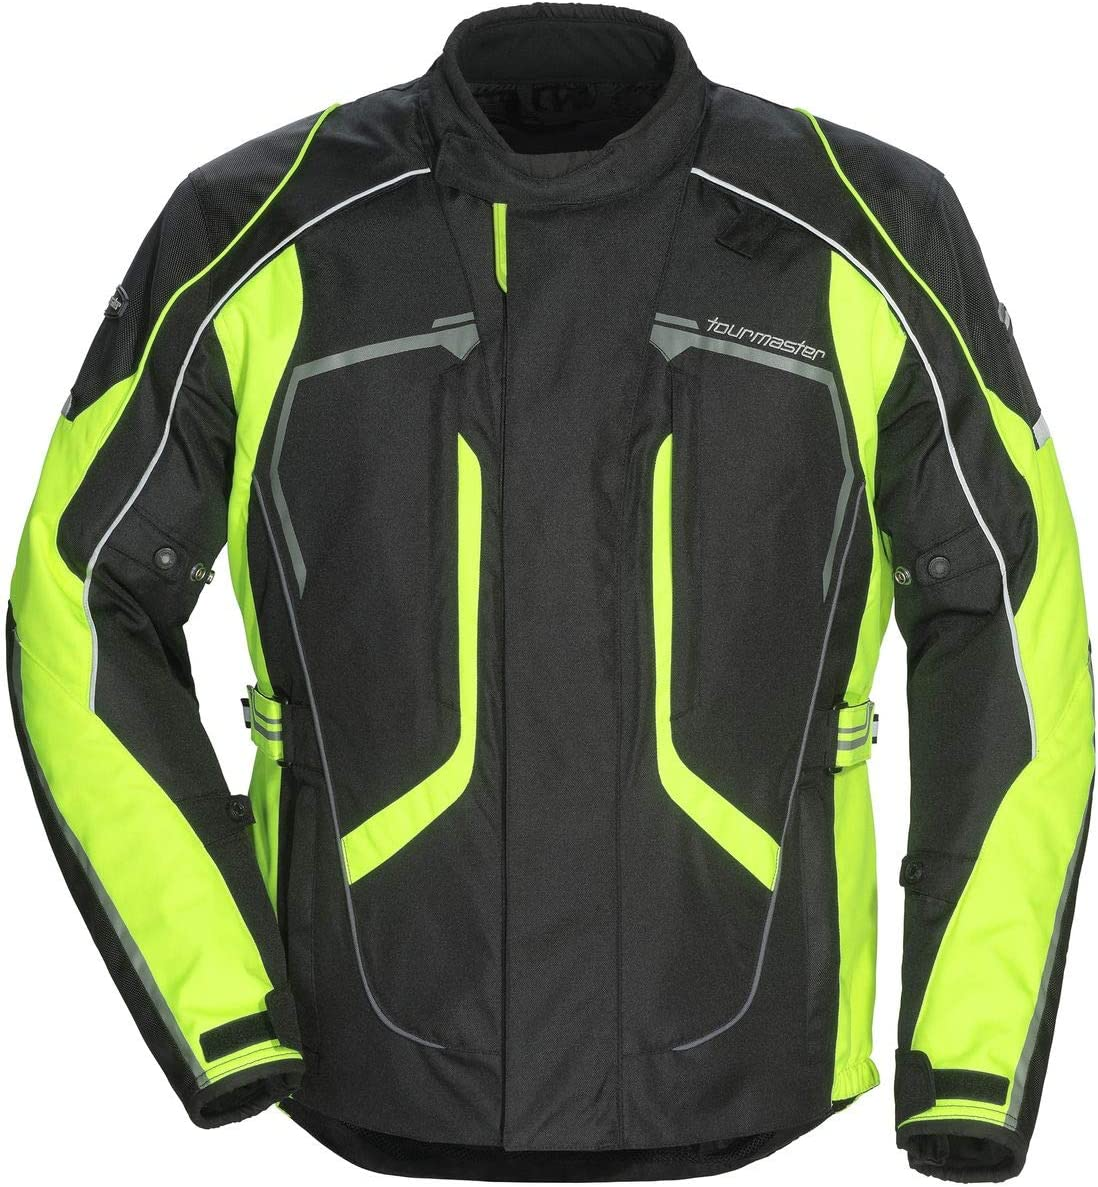 Tourmaster Advanced Men's Textile Motorcycle Jacket